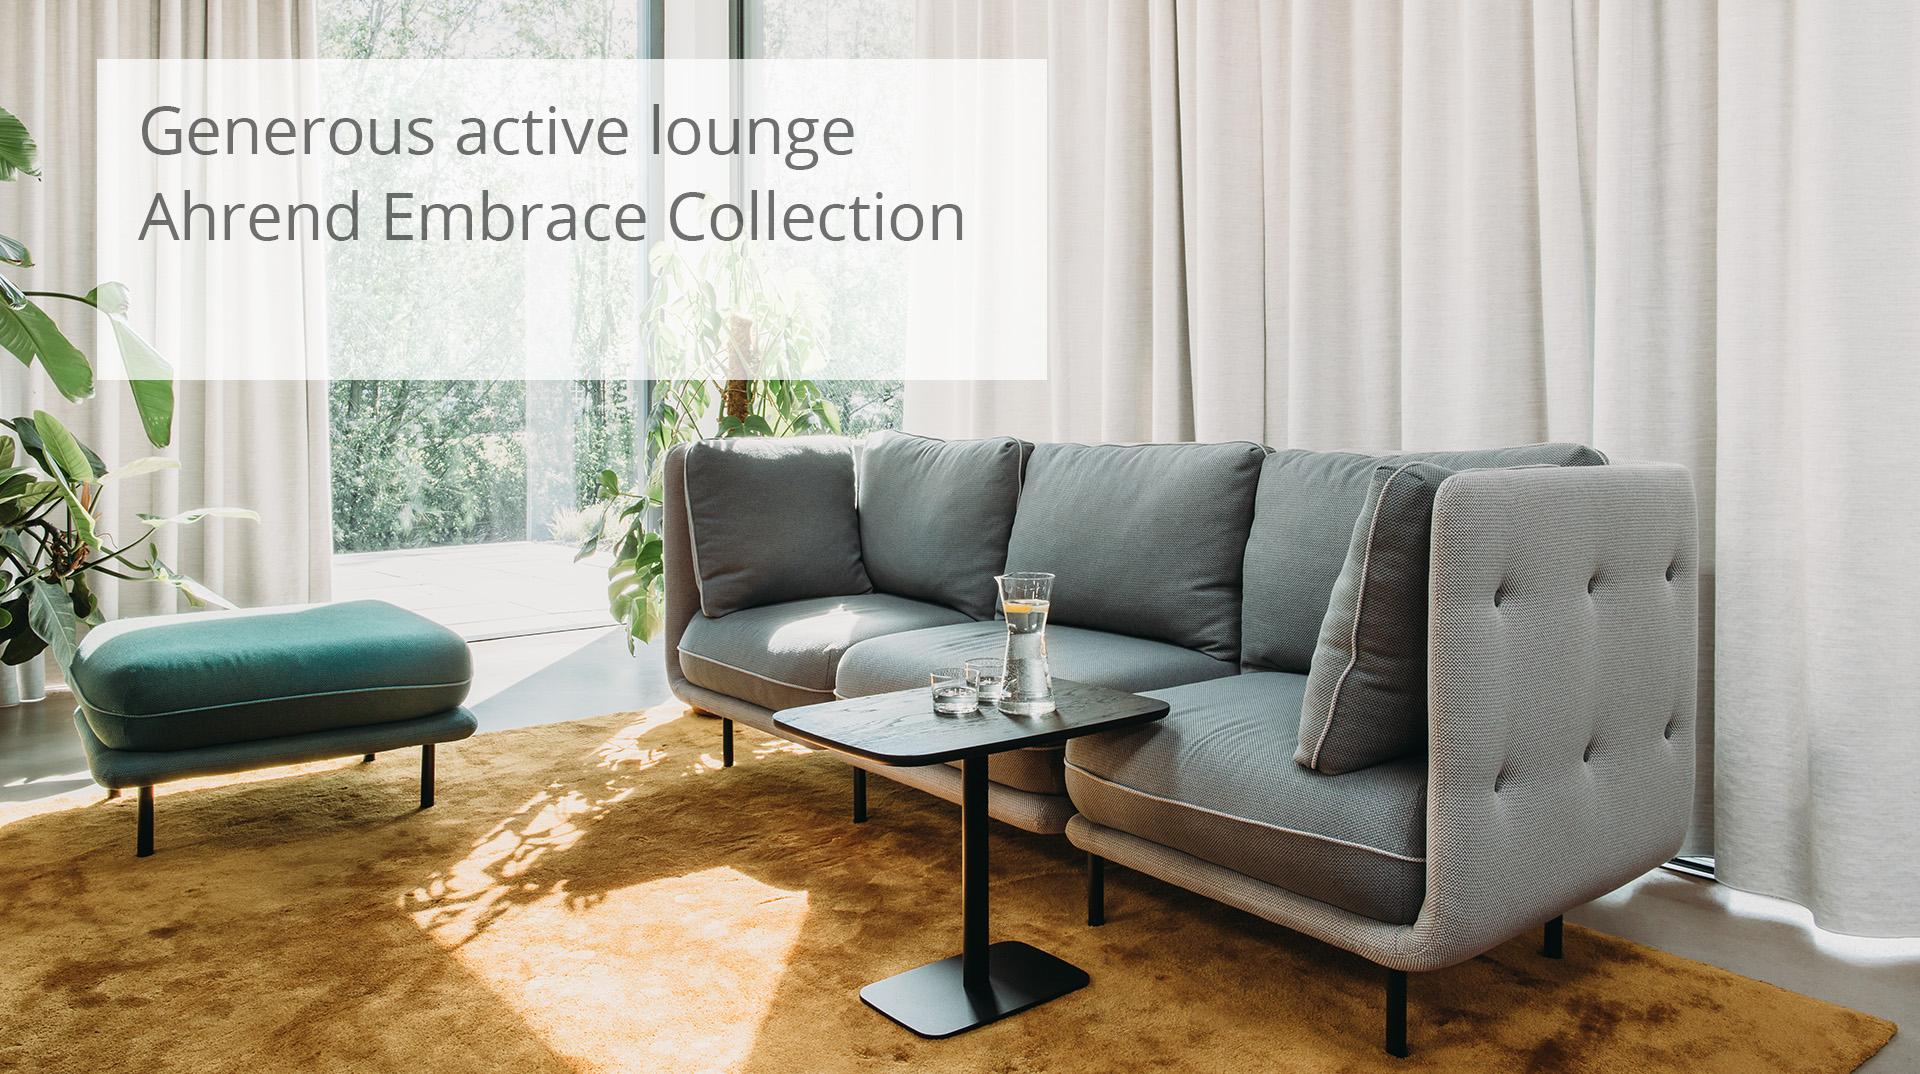 HofmanDujardin Embrace Collection Ahrend